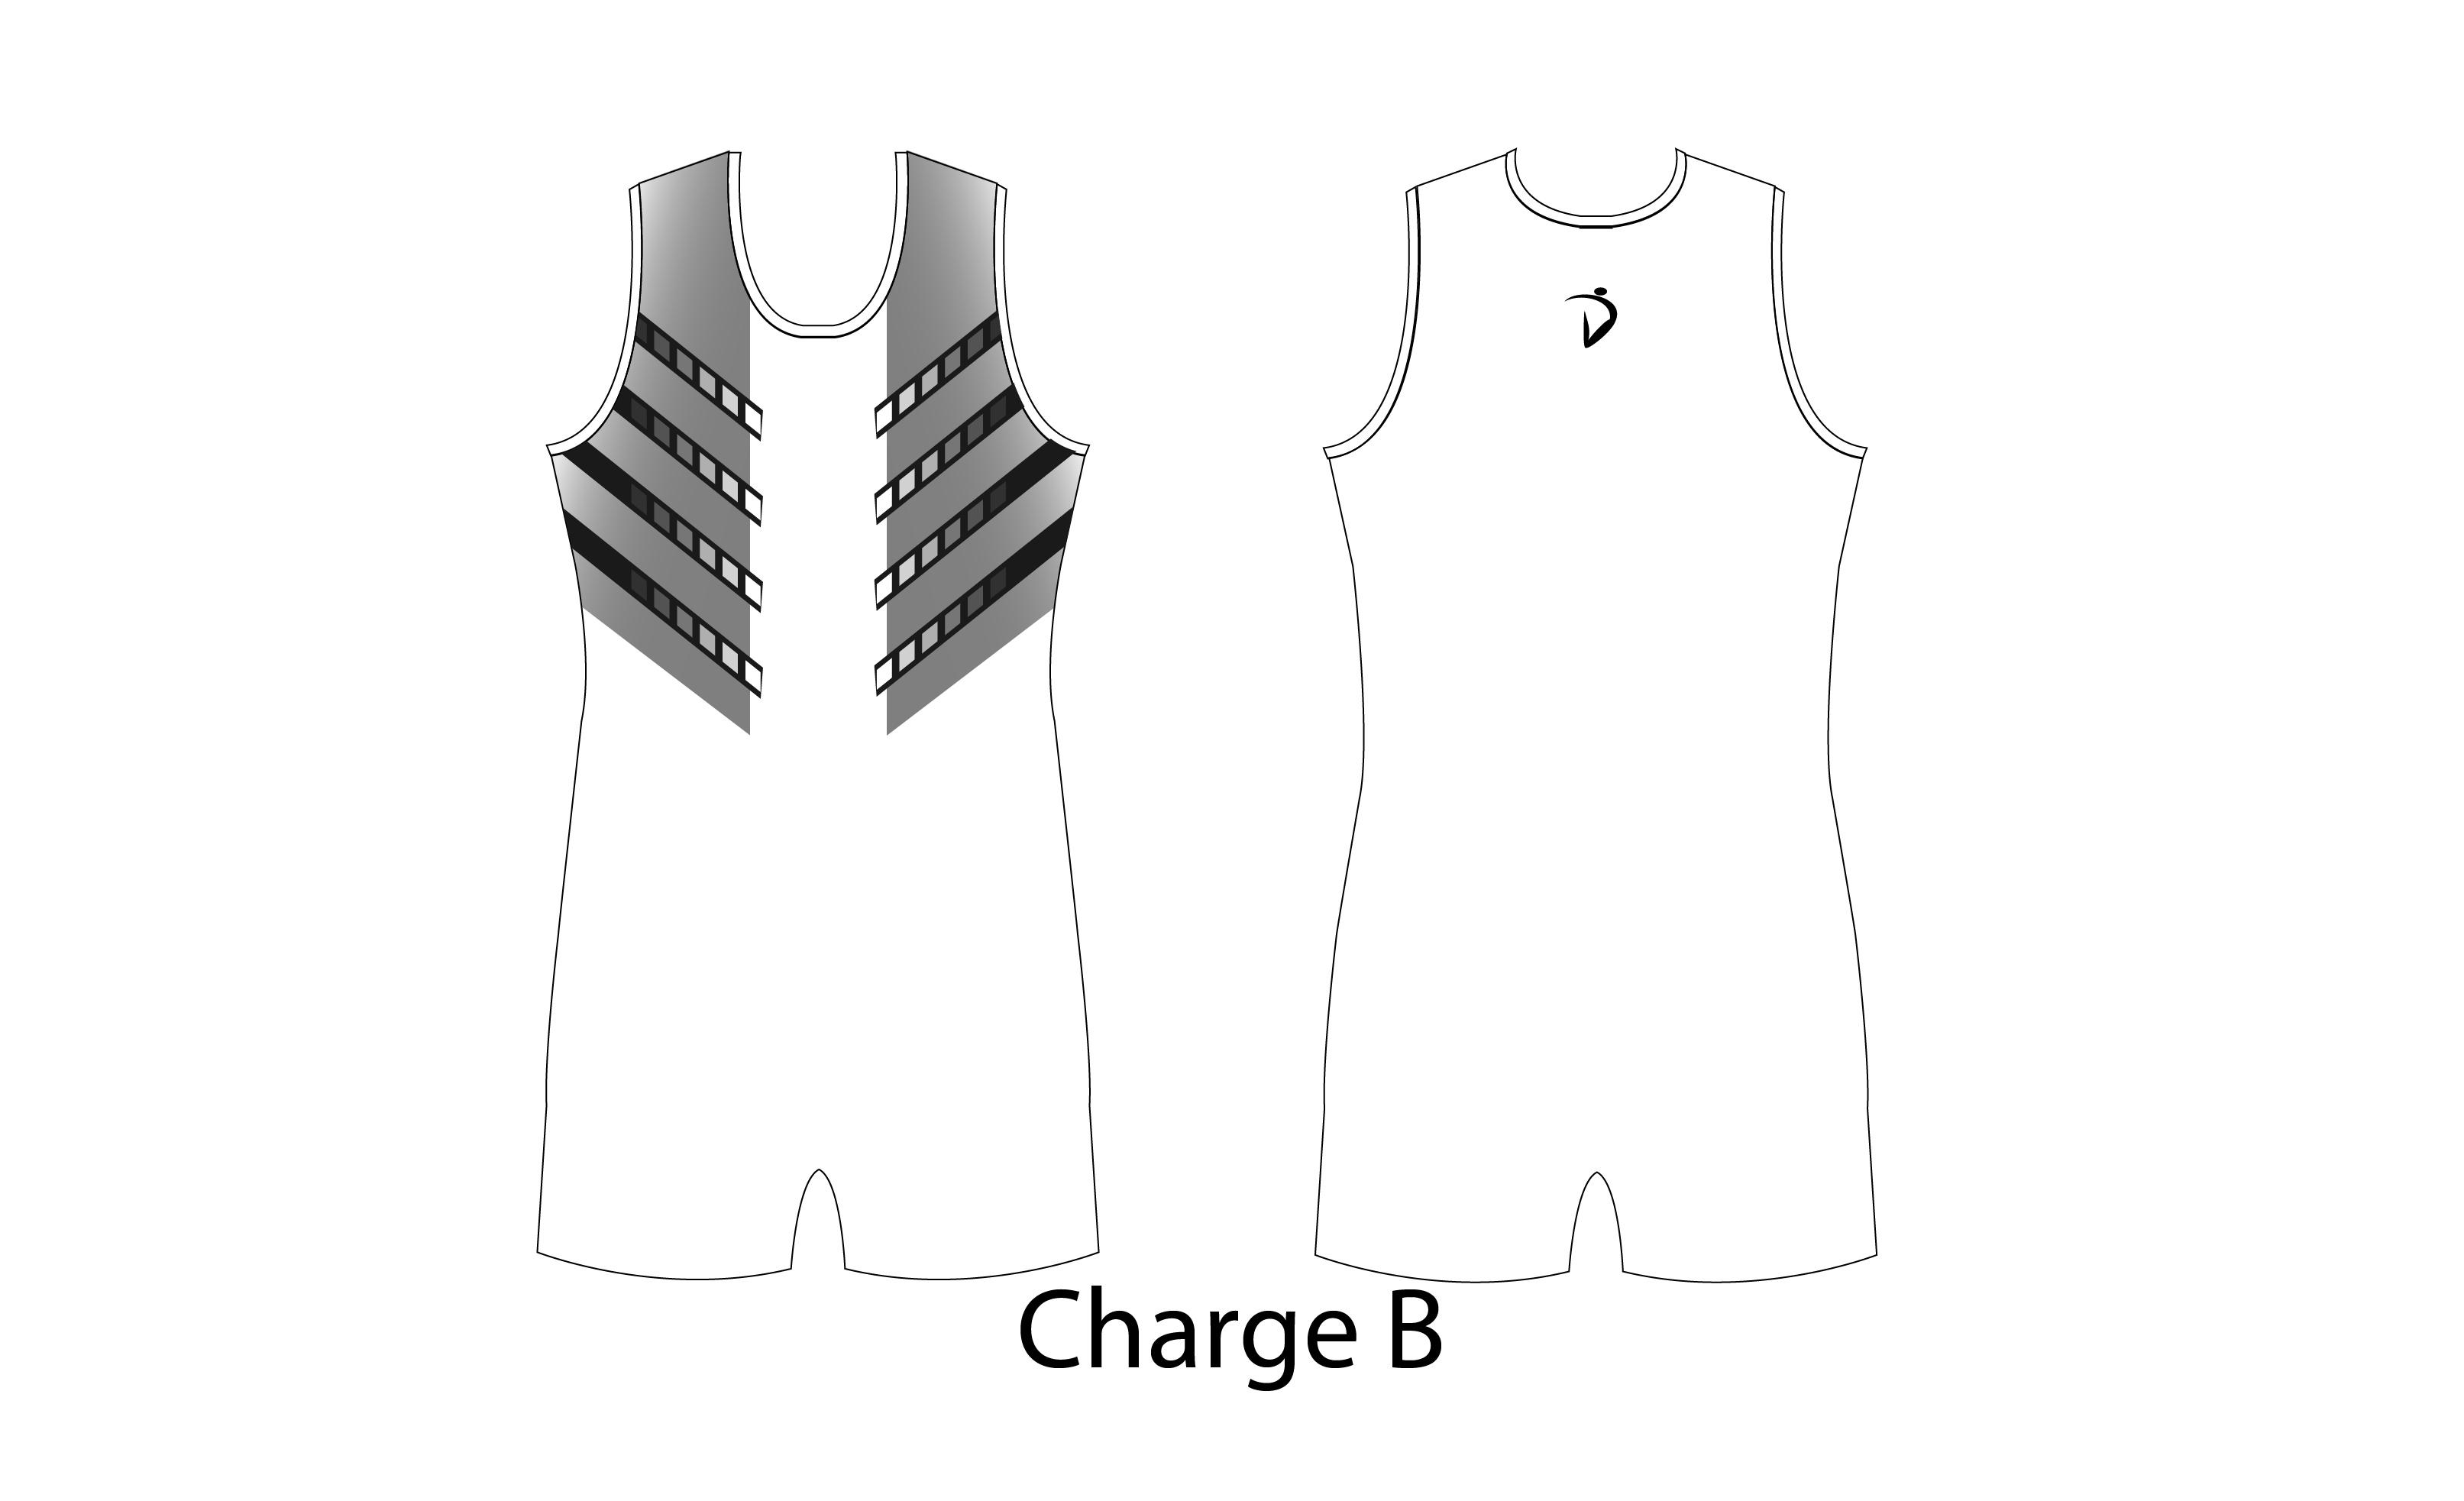 Charge B